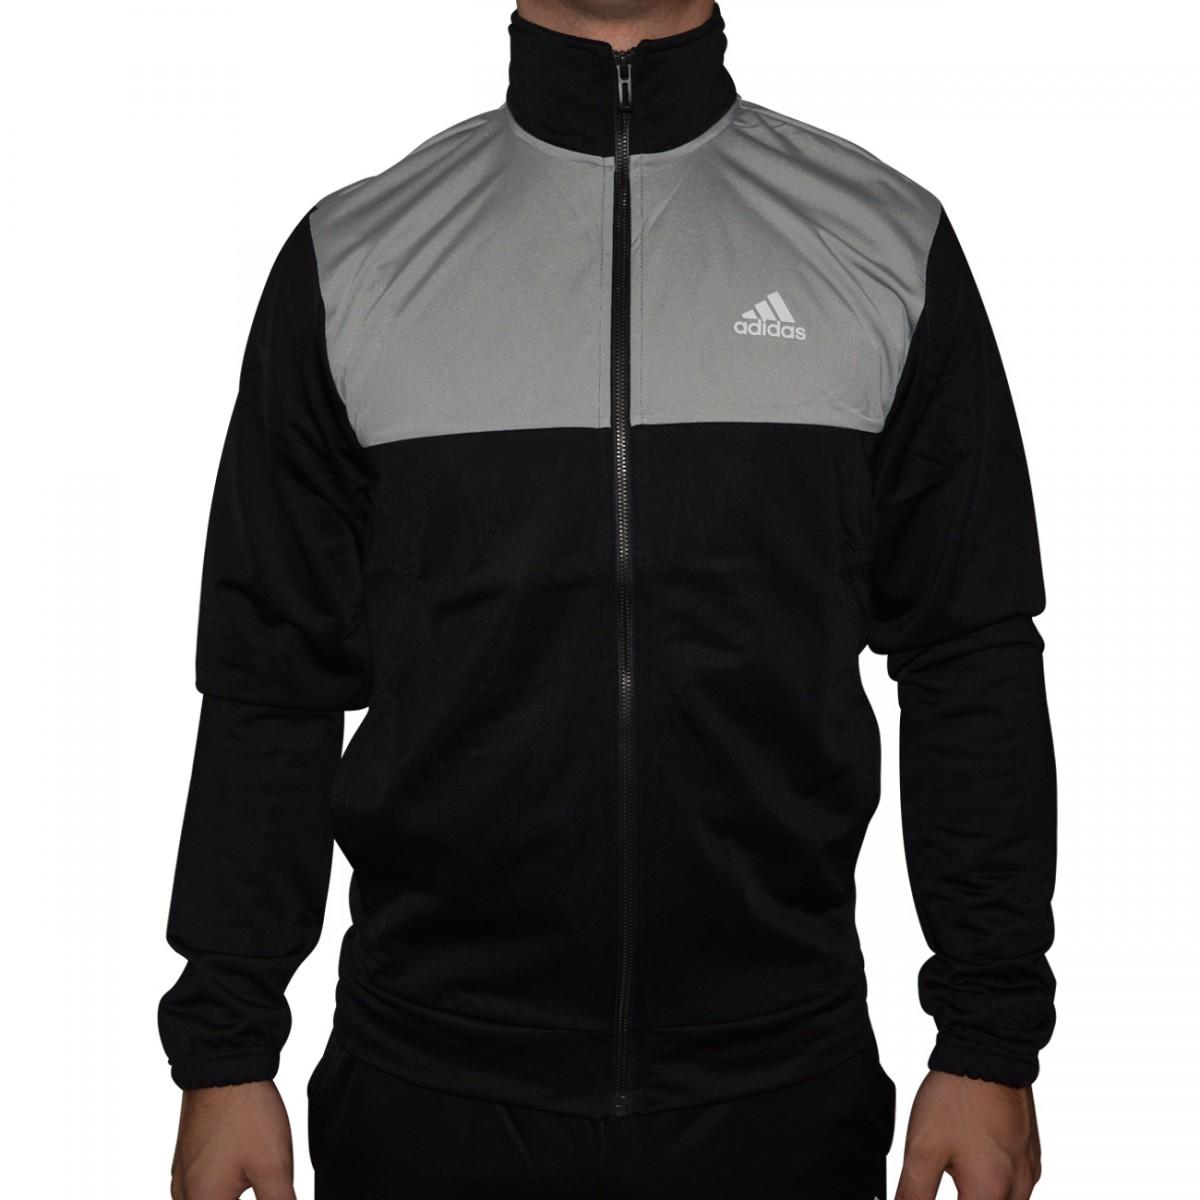 dc99c990d6c Agasalho Adidas Back2Basics TS BK4094 - Preto Cinza - Chuteira Nike ...